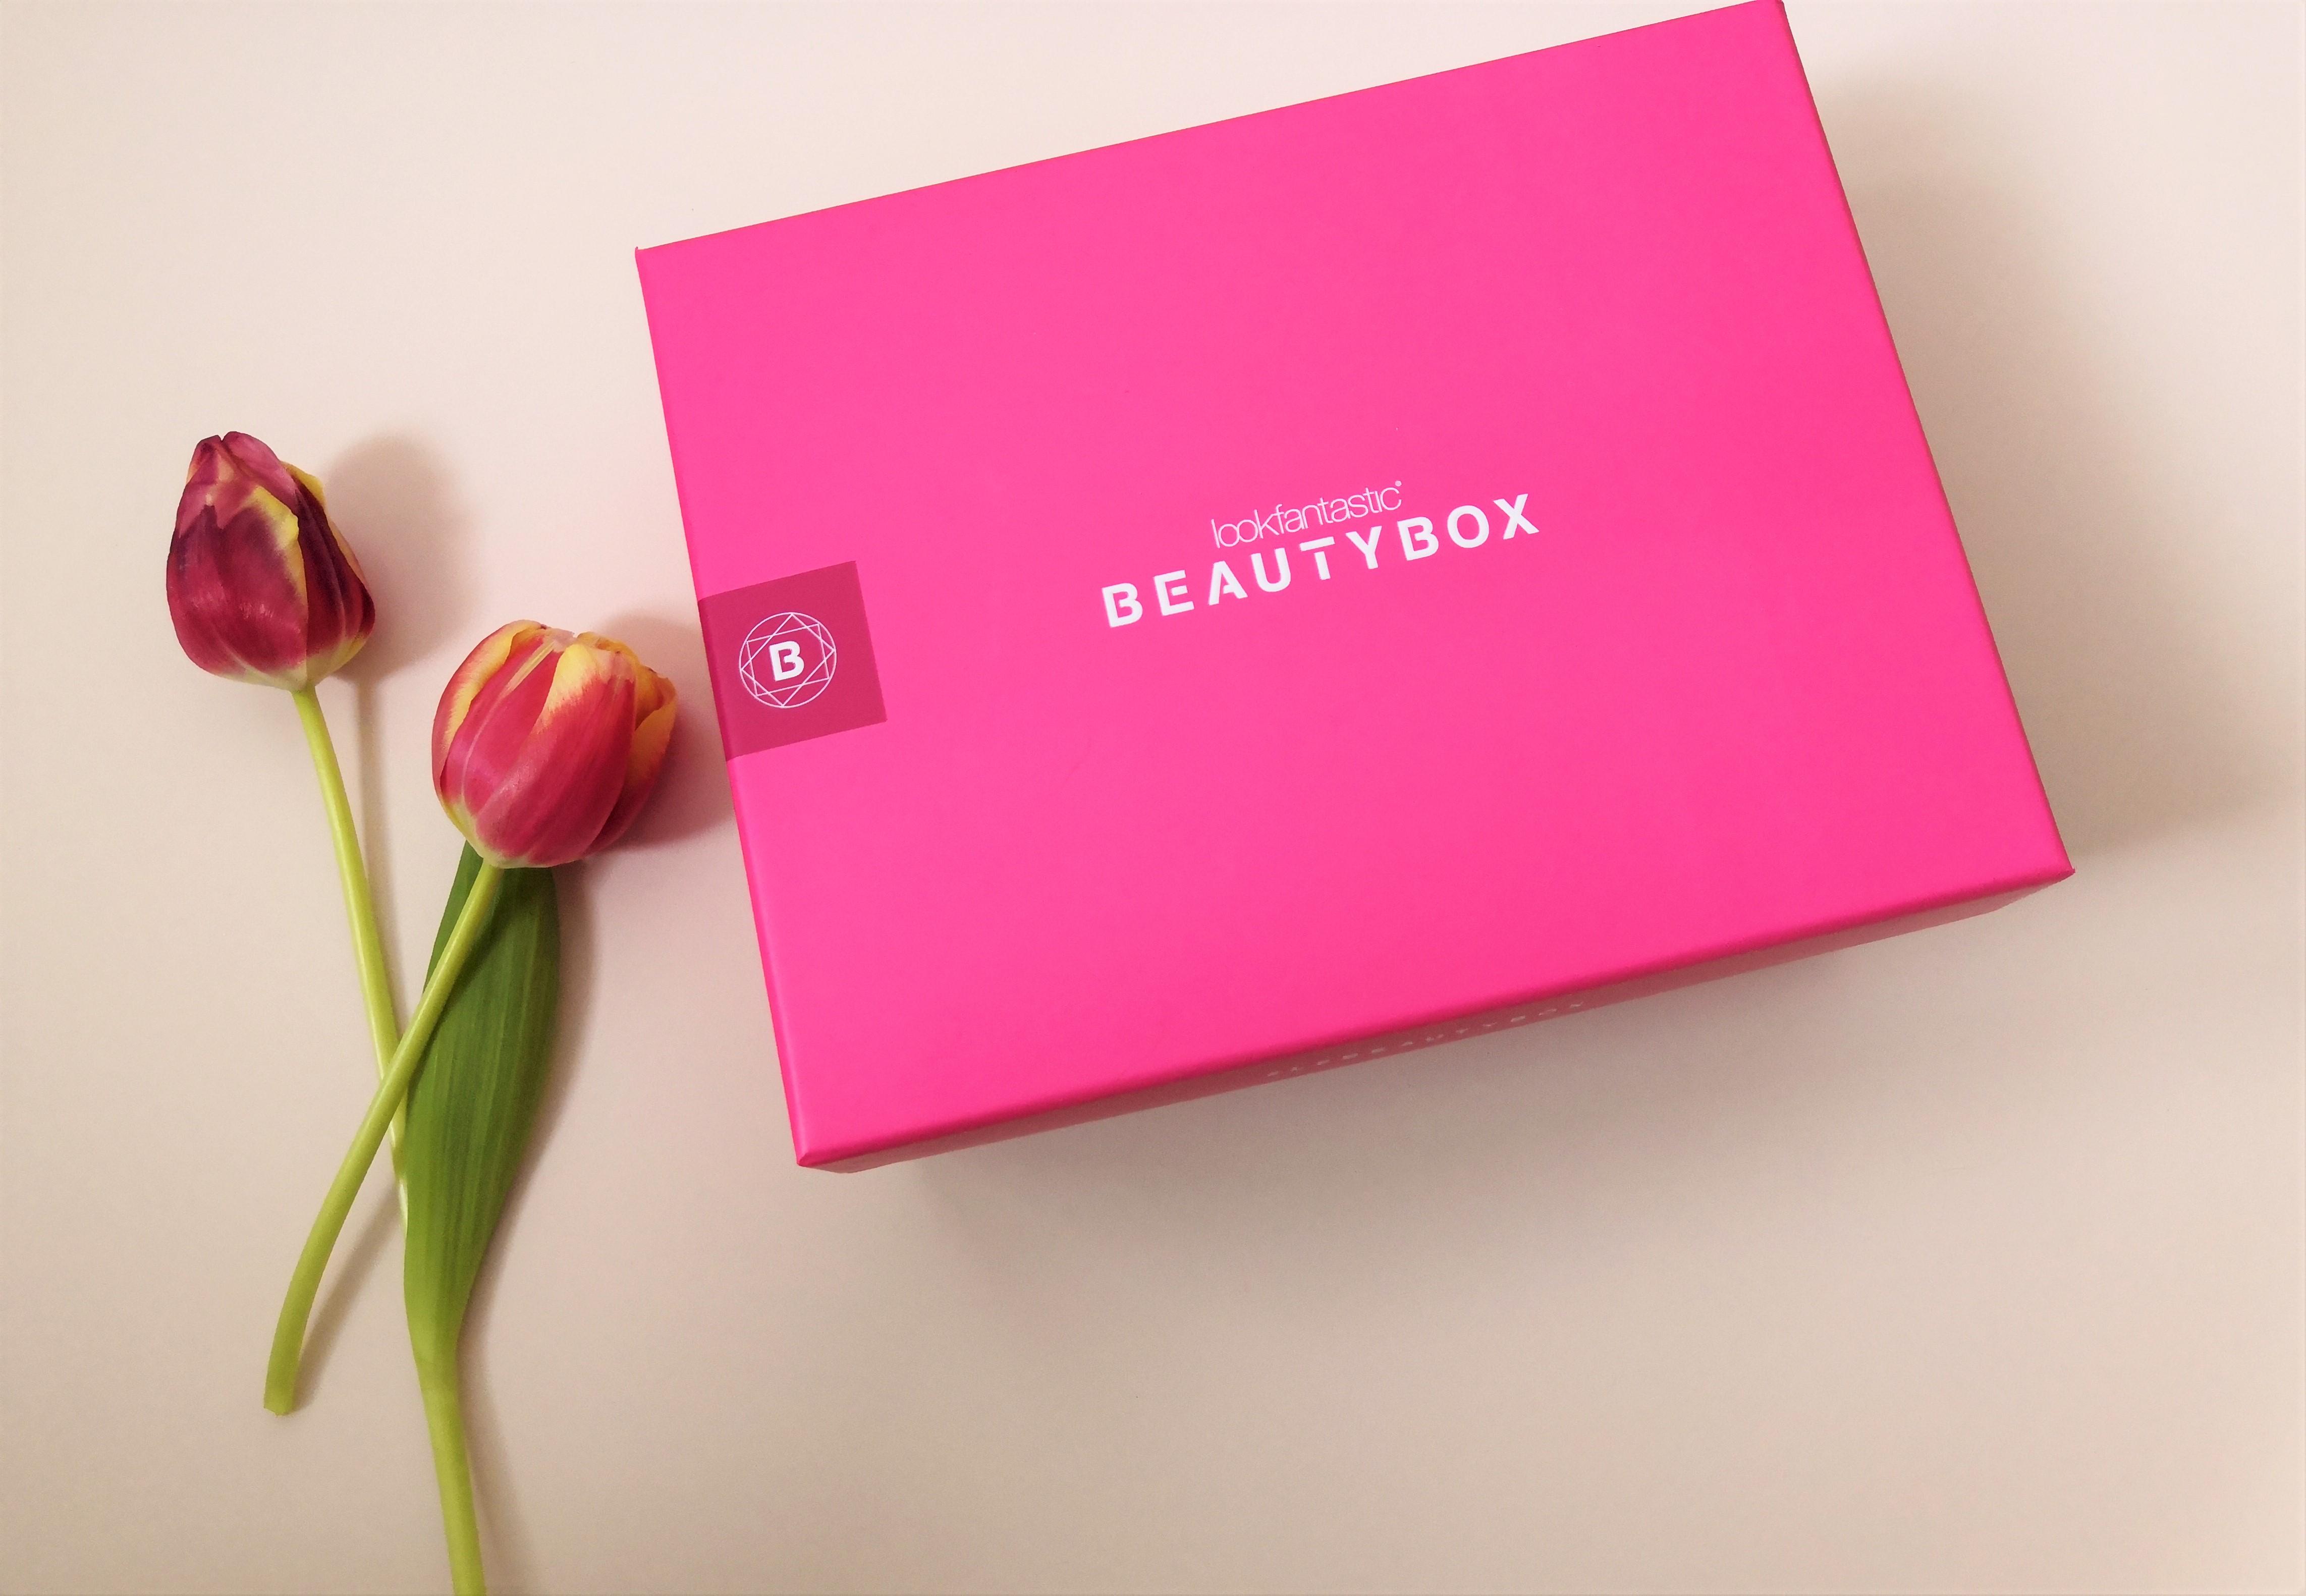 Lookfantastic beautybox: Amour edition